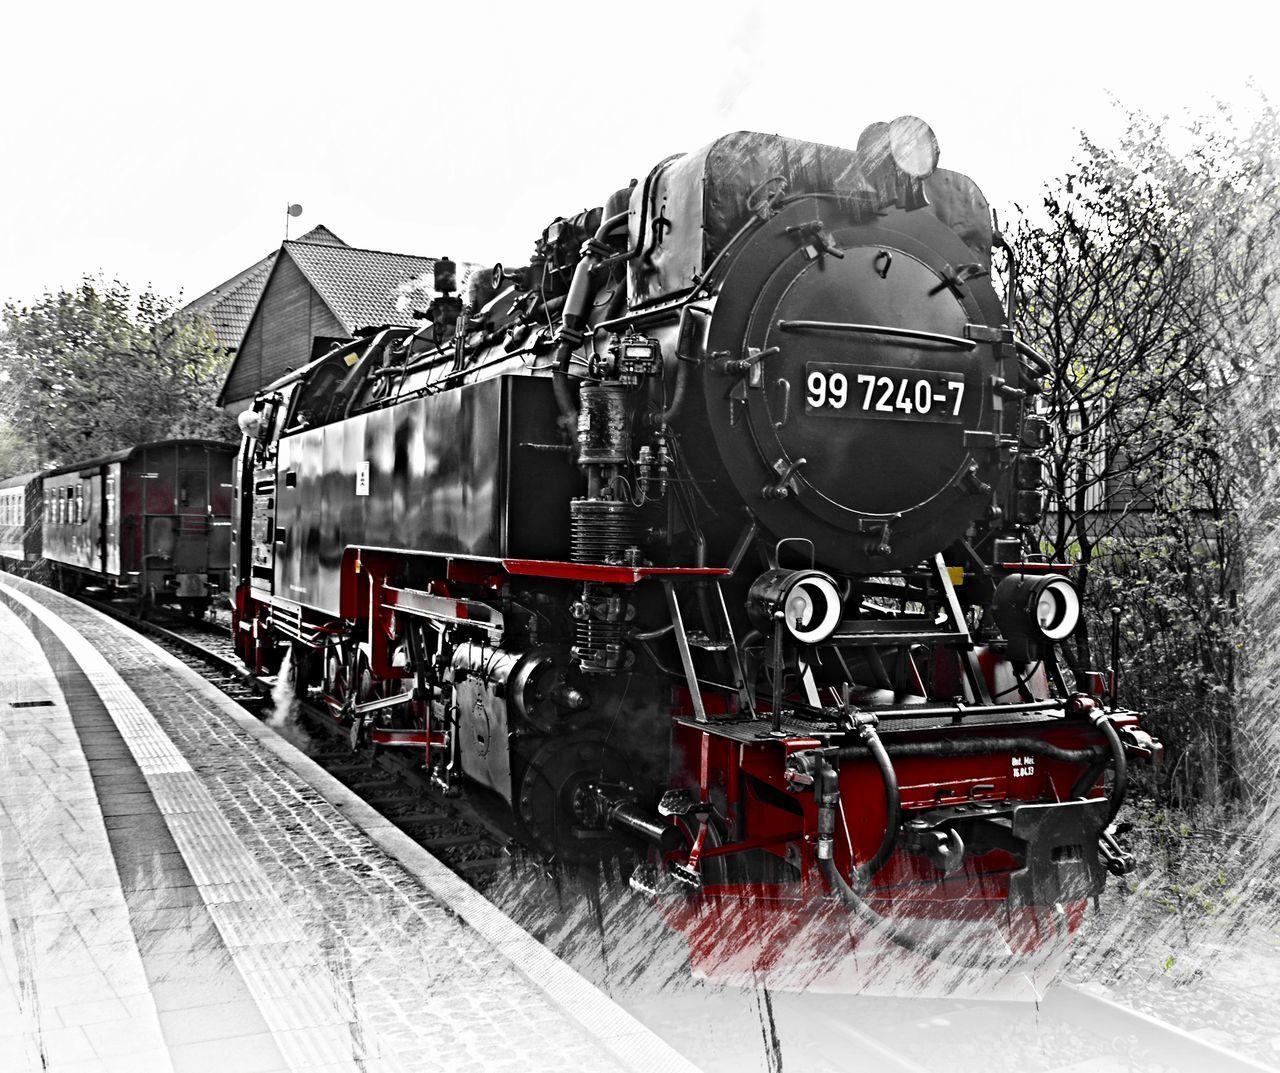 TRAIN IN RAILROAD TRACKS AGAINST SKY